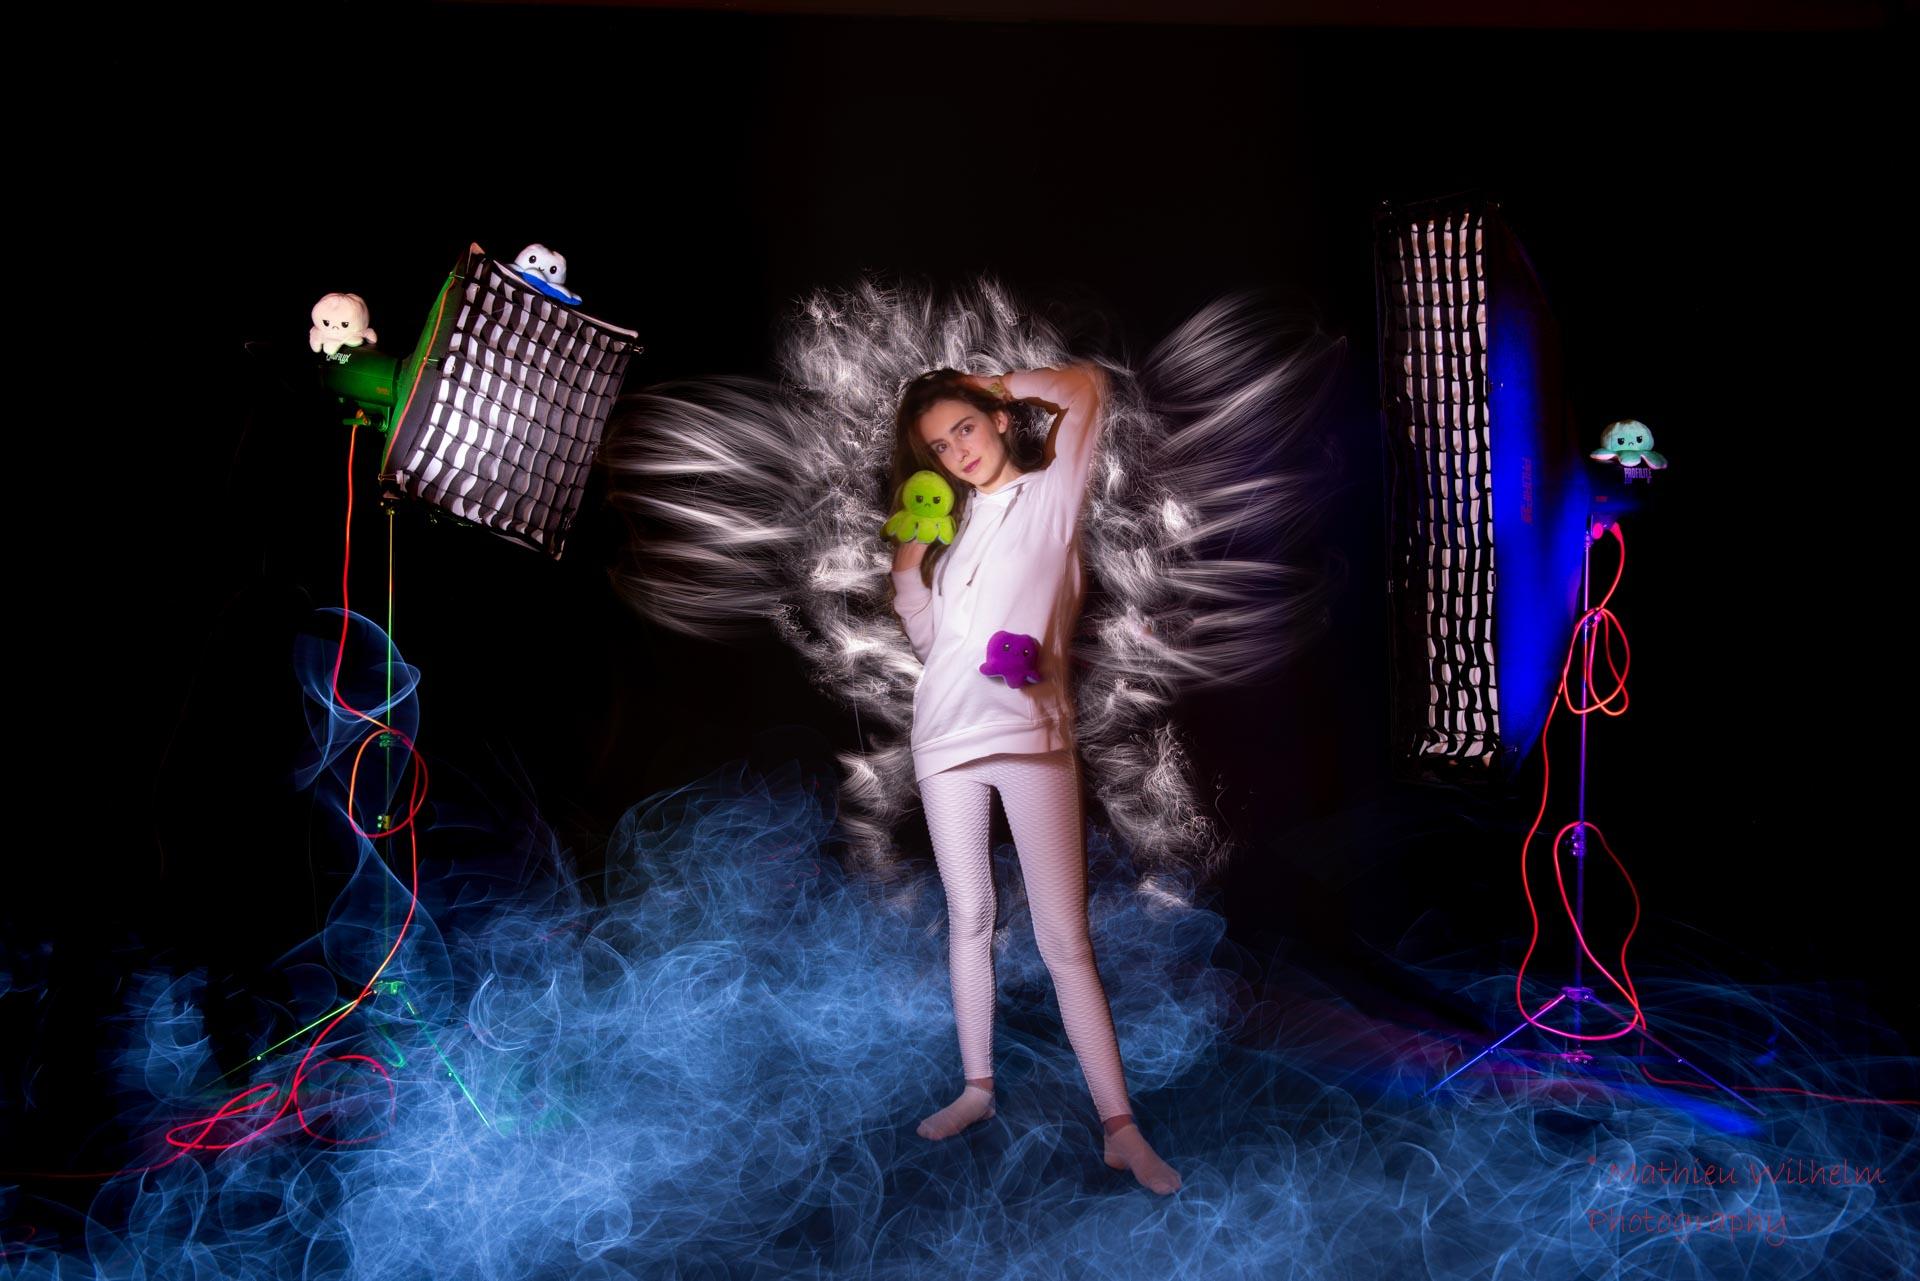 2021-01-07 Camille - Lightpainting studi